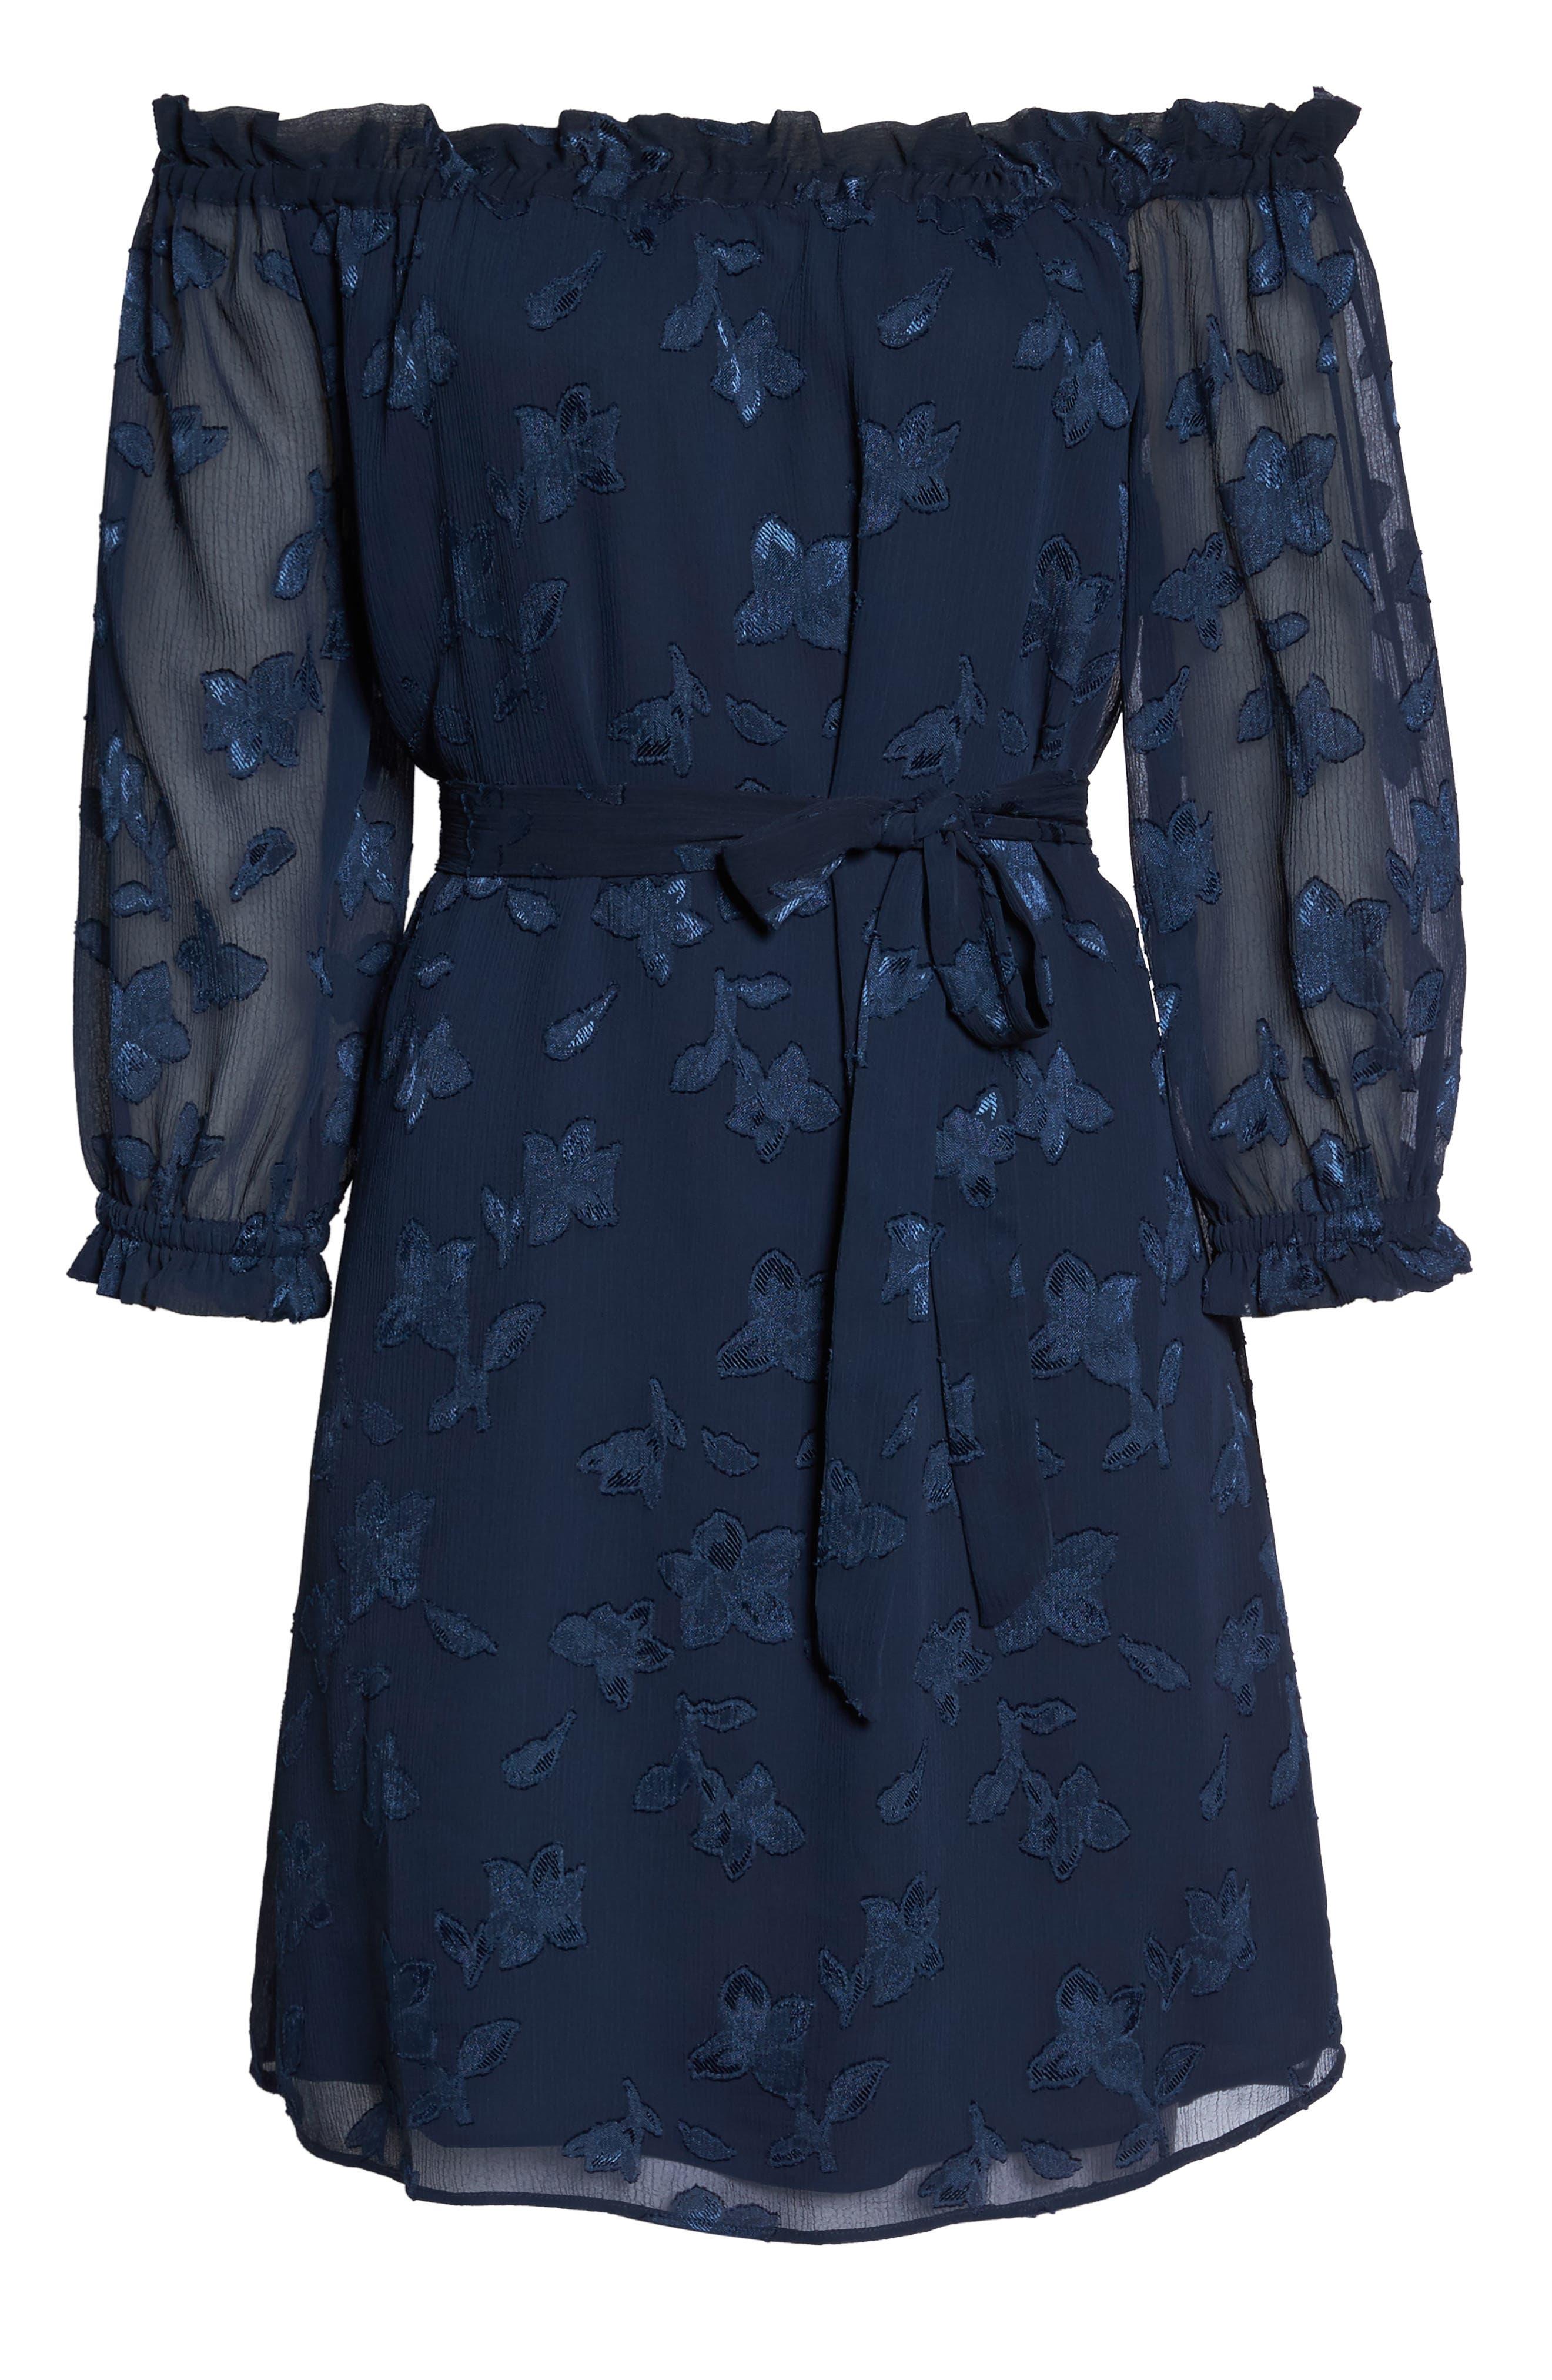 Off the Shoulder Lace Dress,                             Alternate thumbnail 6, color,                             Navy